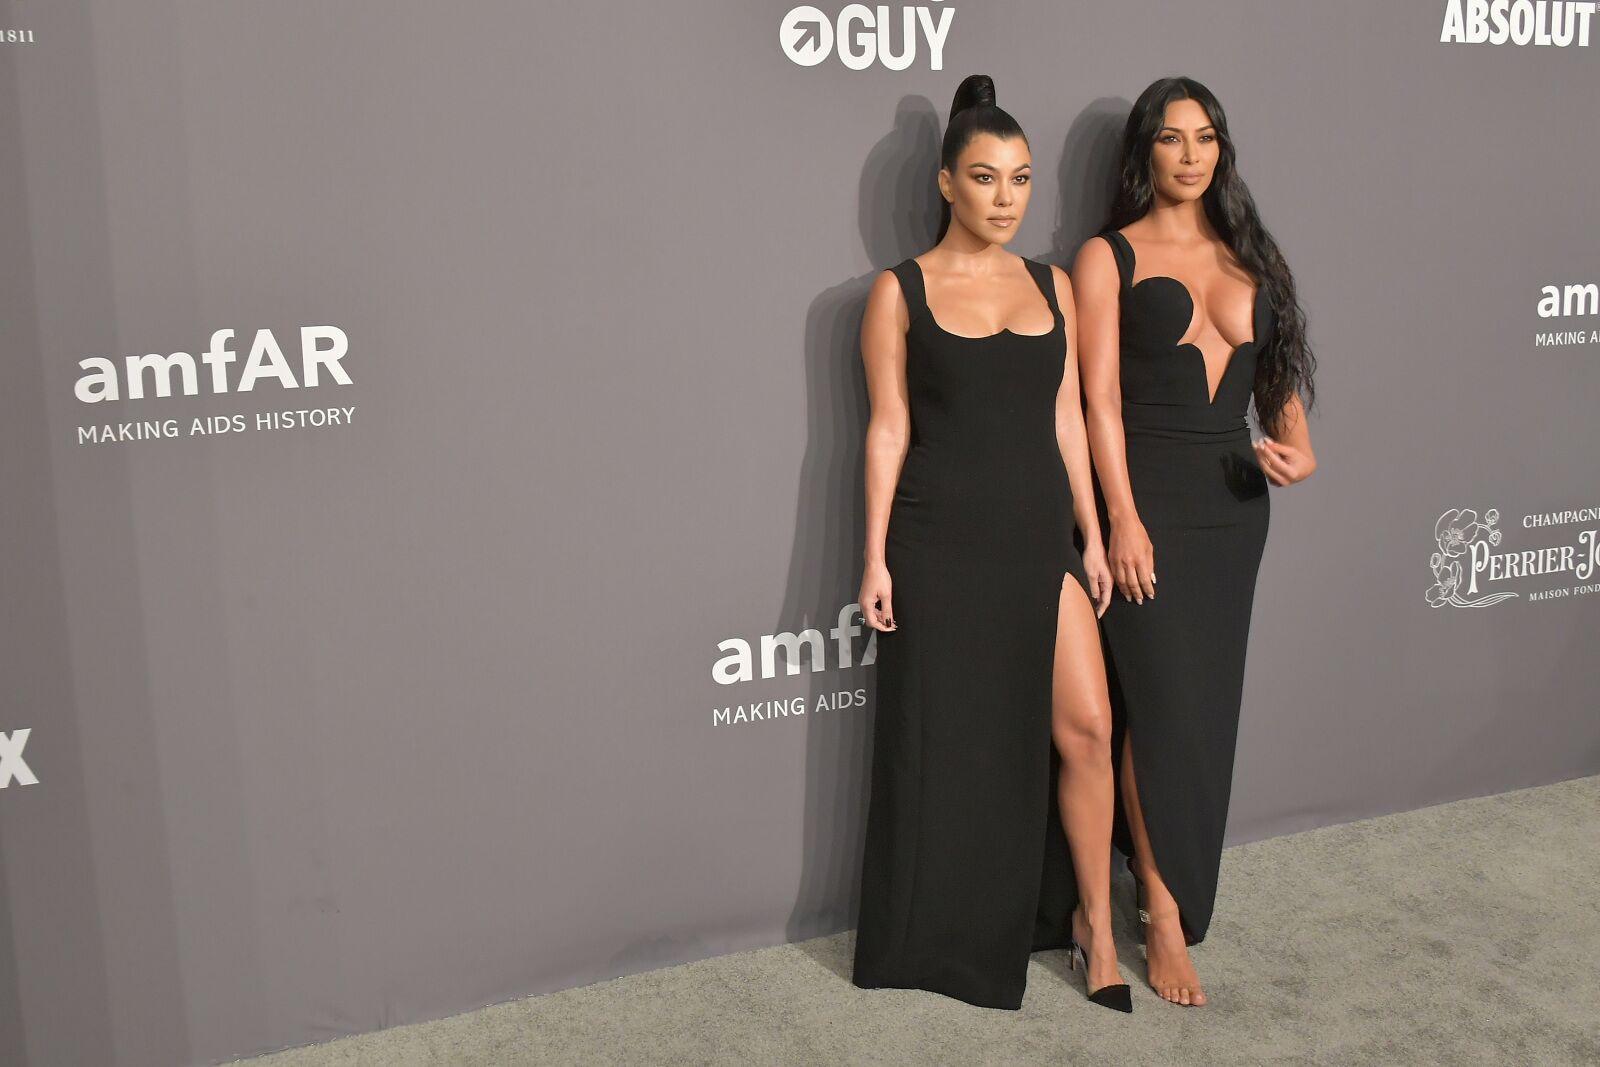 04dfeb4b Kim Kardashian poses in brightly colored dress, shows off body